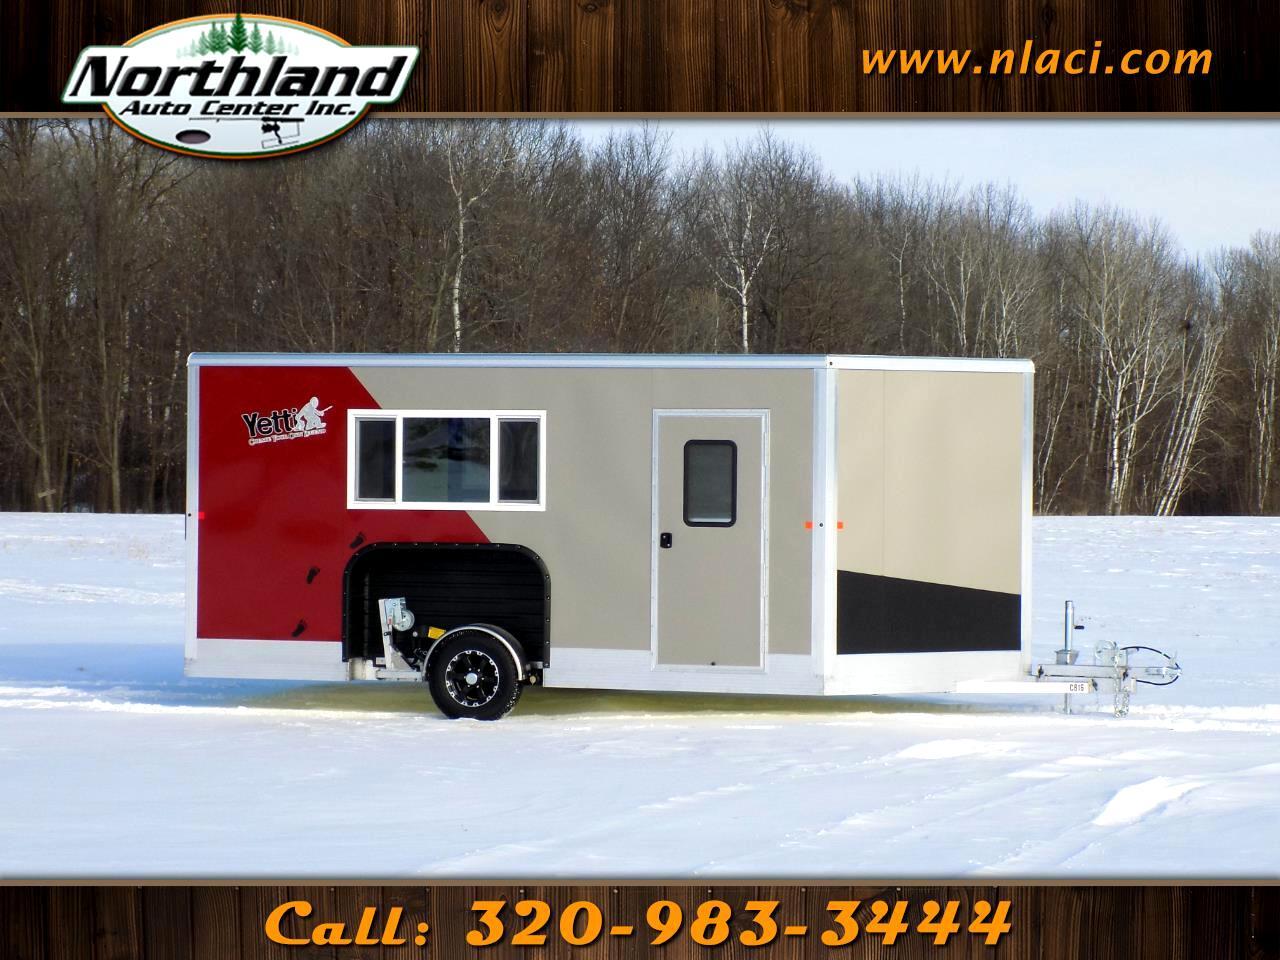 2019 Yetti Angler Edition 8x16 Northland Custom Cabin (Luxe)